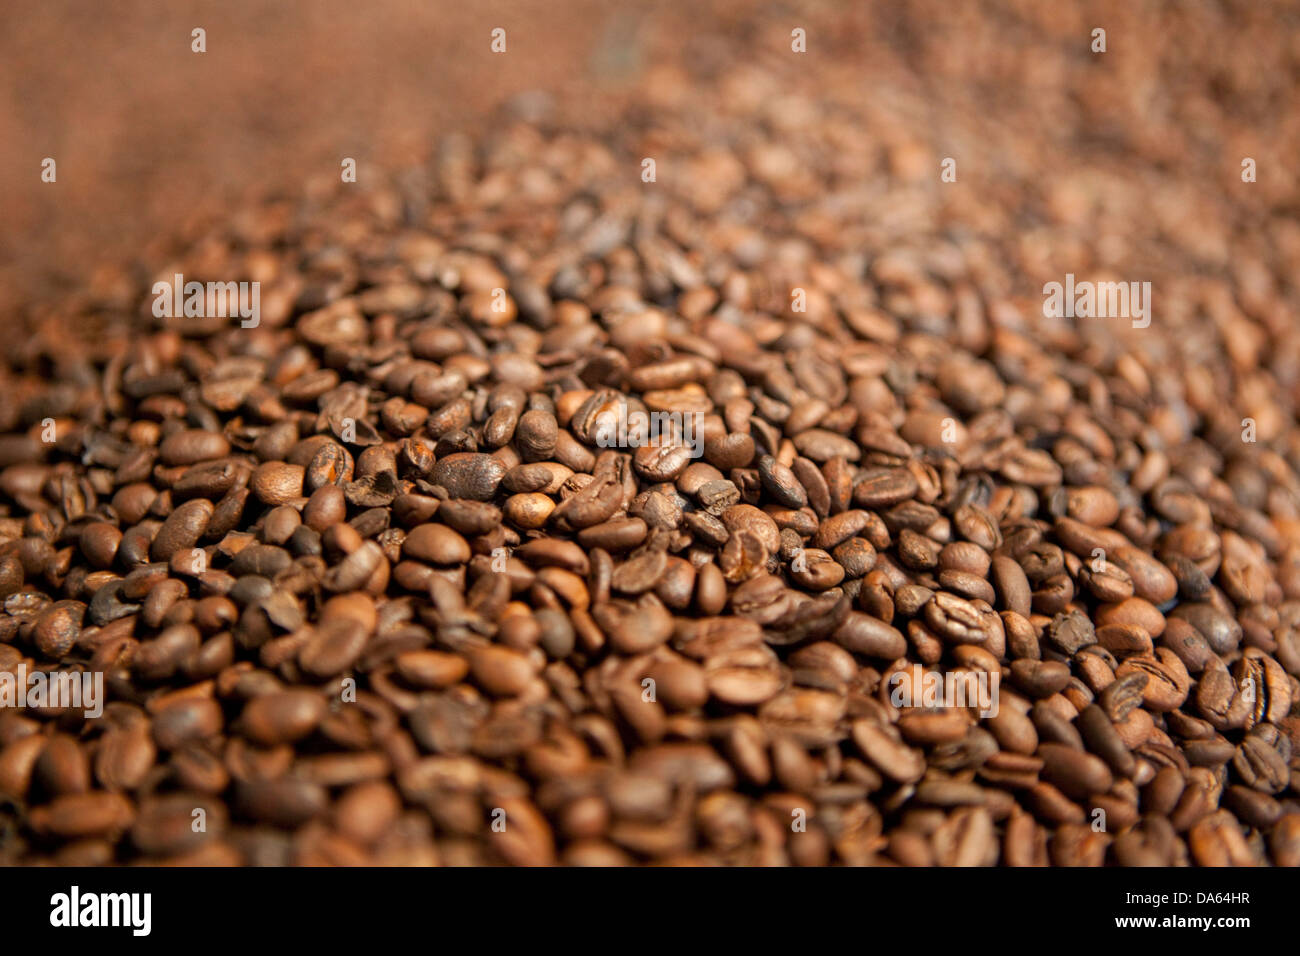 Kaffee, Produktion, Harar, Äthiopien, UNESCO, Weltkulturerbe, Afrika, Stadt, Stadt, Kaffee mahlen, Stockbild